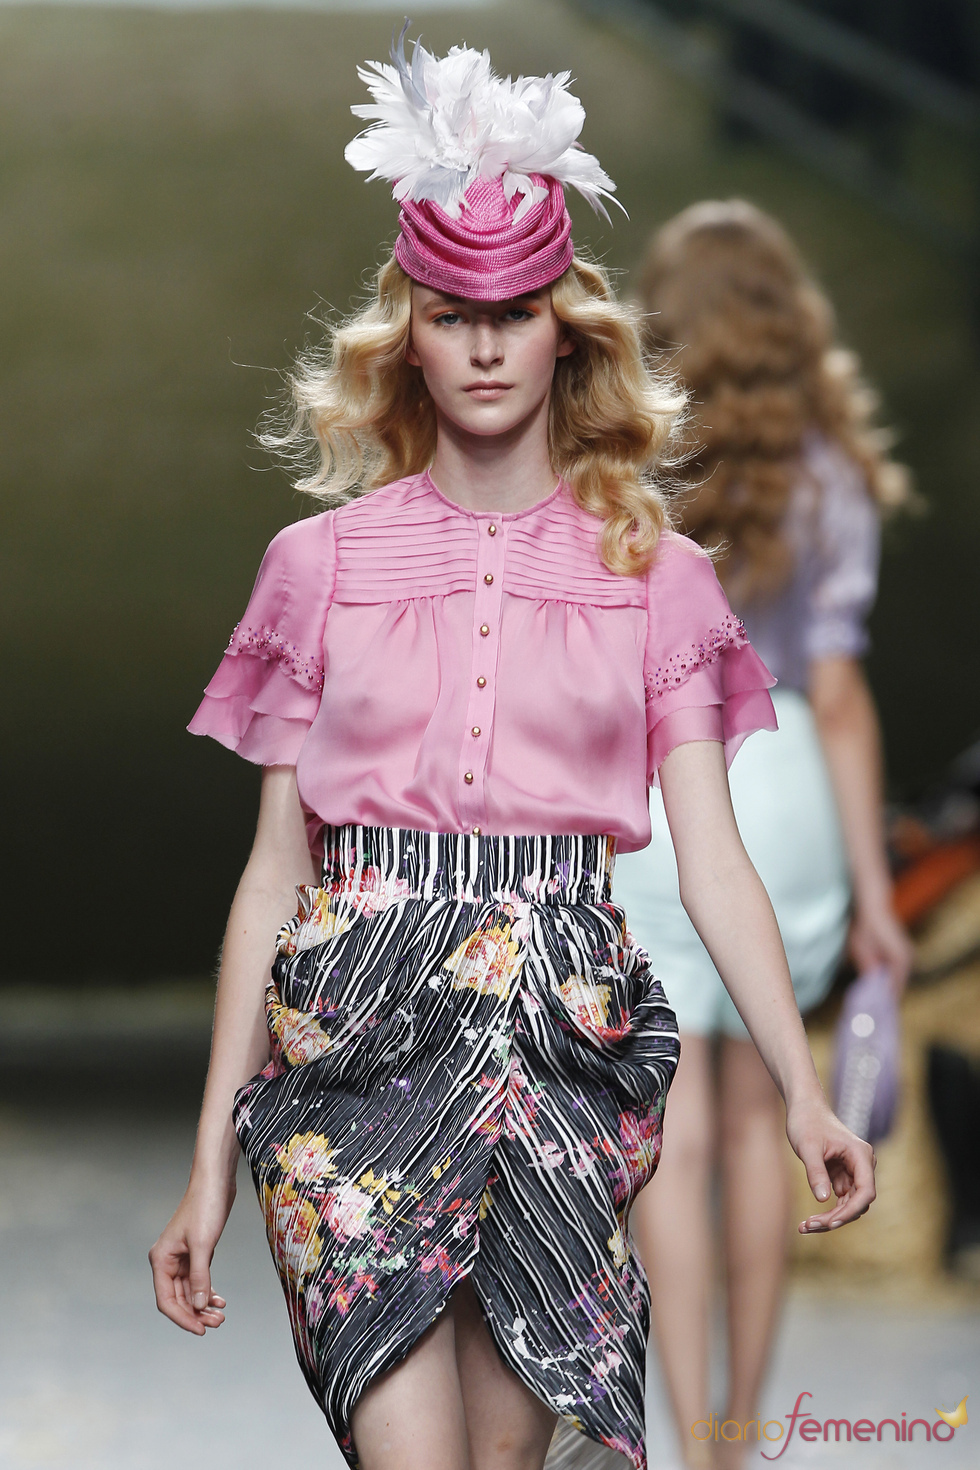 Cibeles Madrid Fashion Week 09-2010: Alma Aguilar